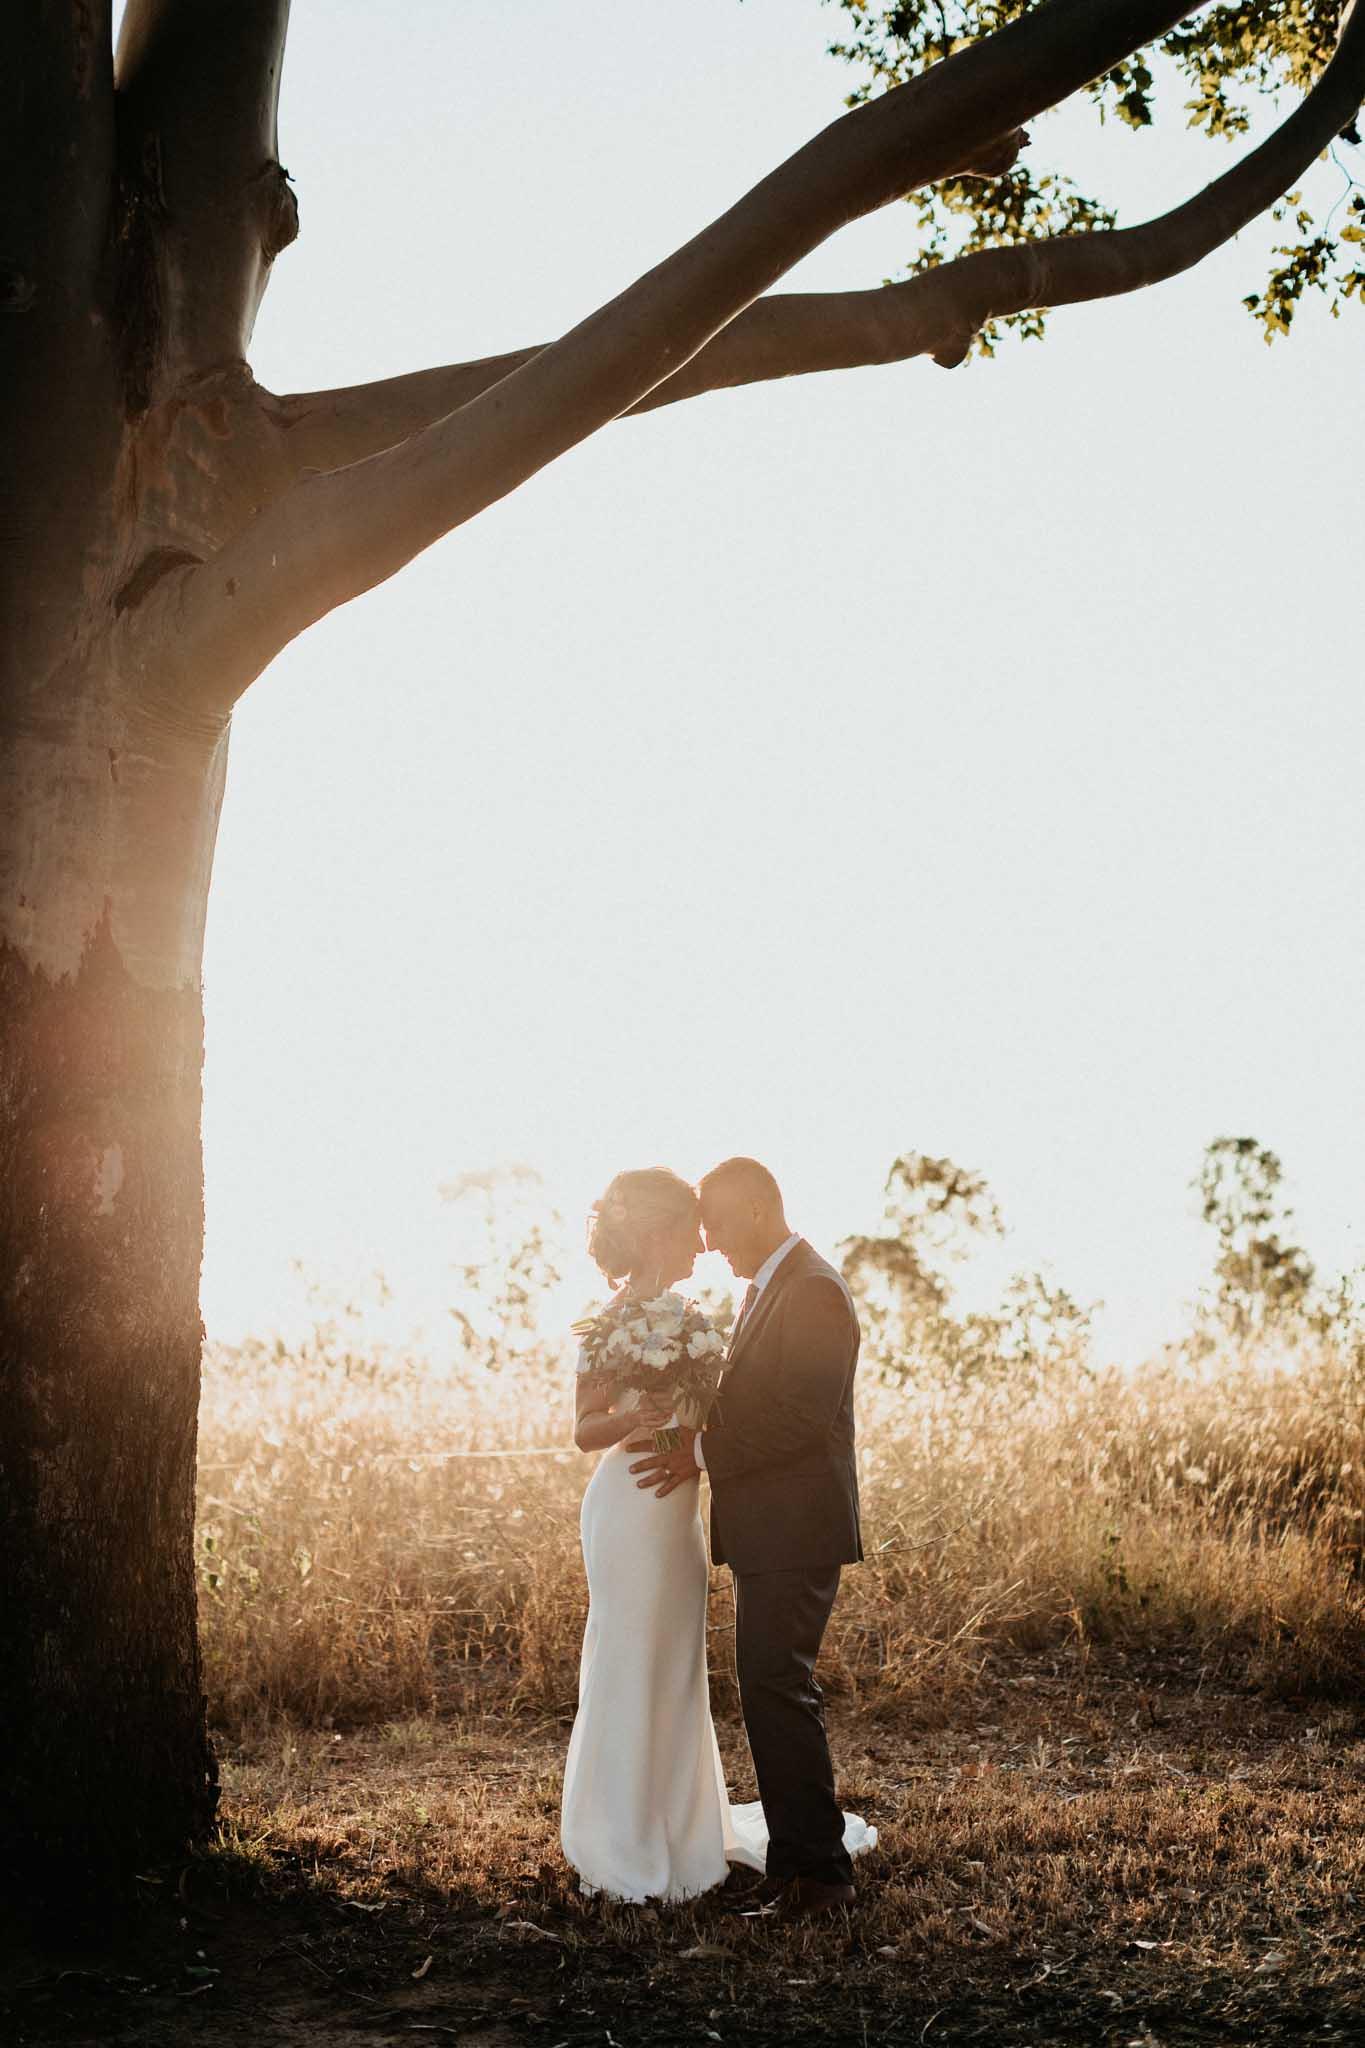 Brisbane-Wedding-Photography-Natalie-Skoric.jpg